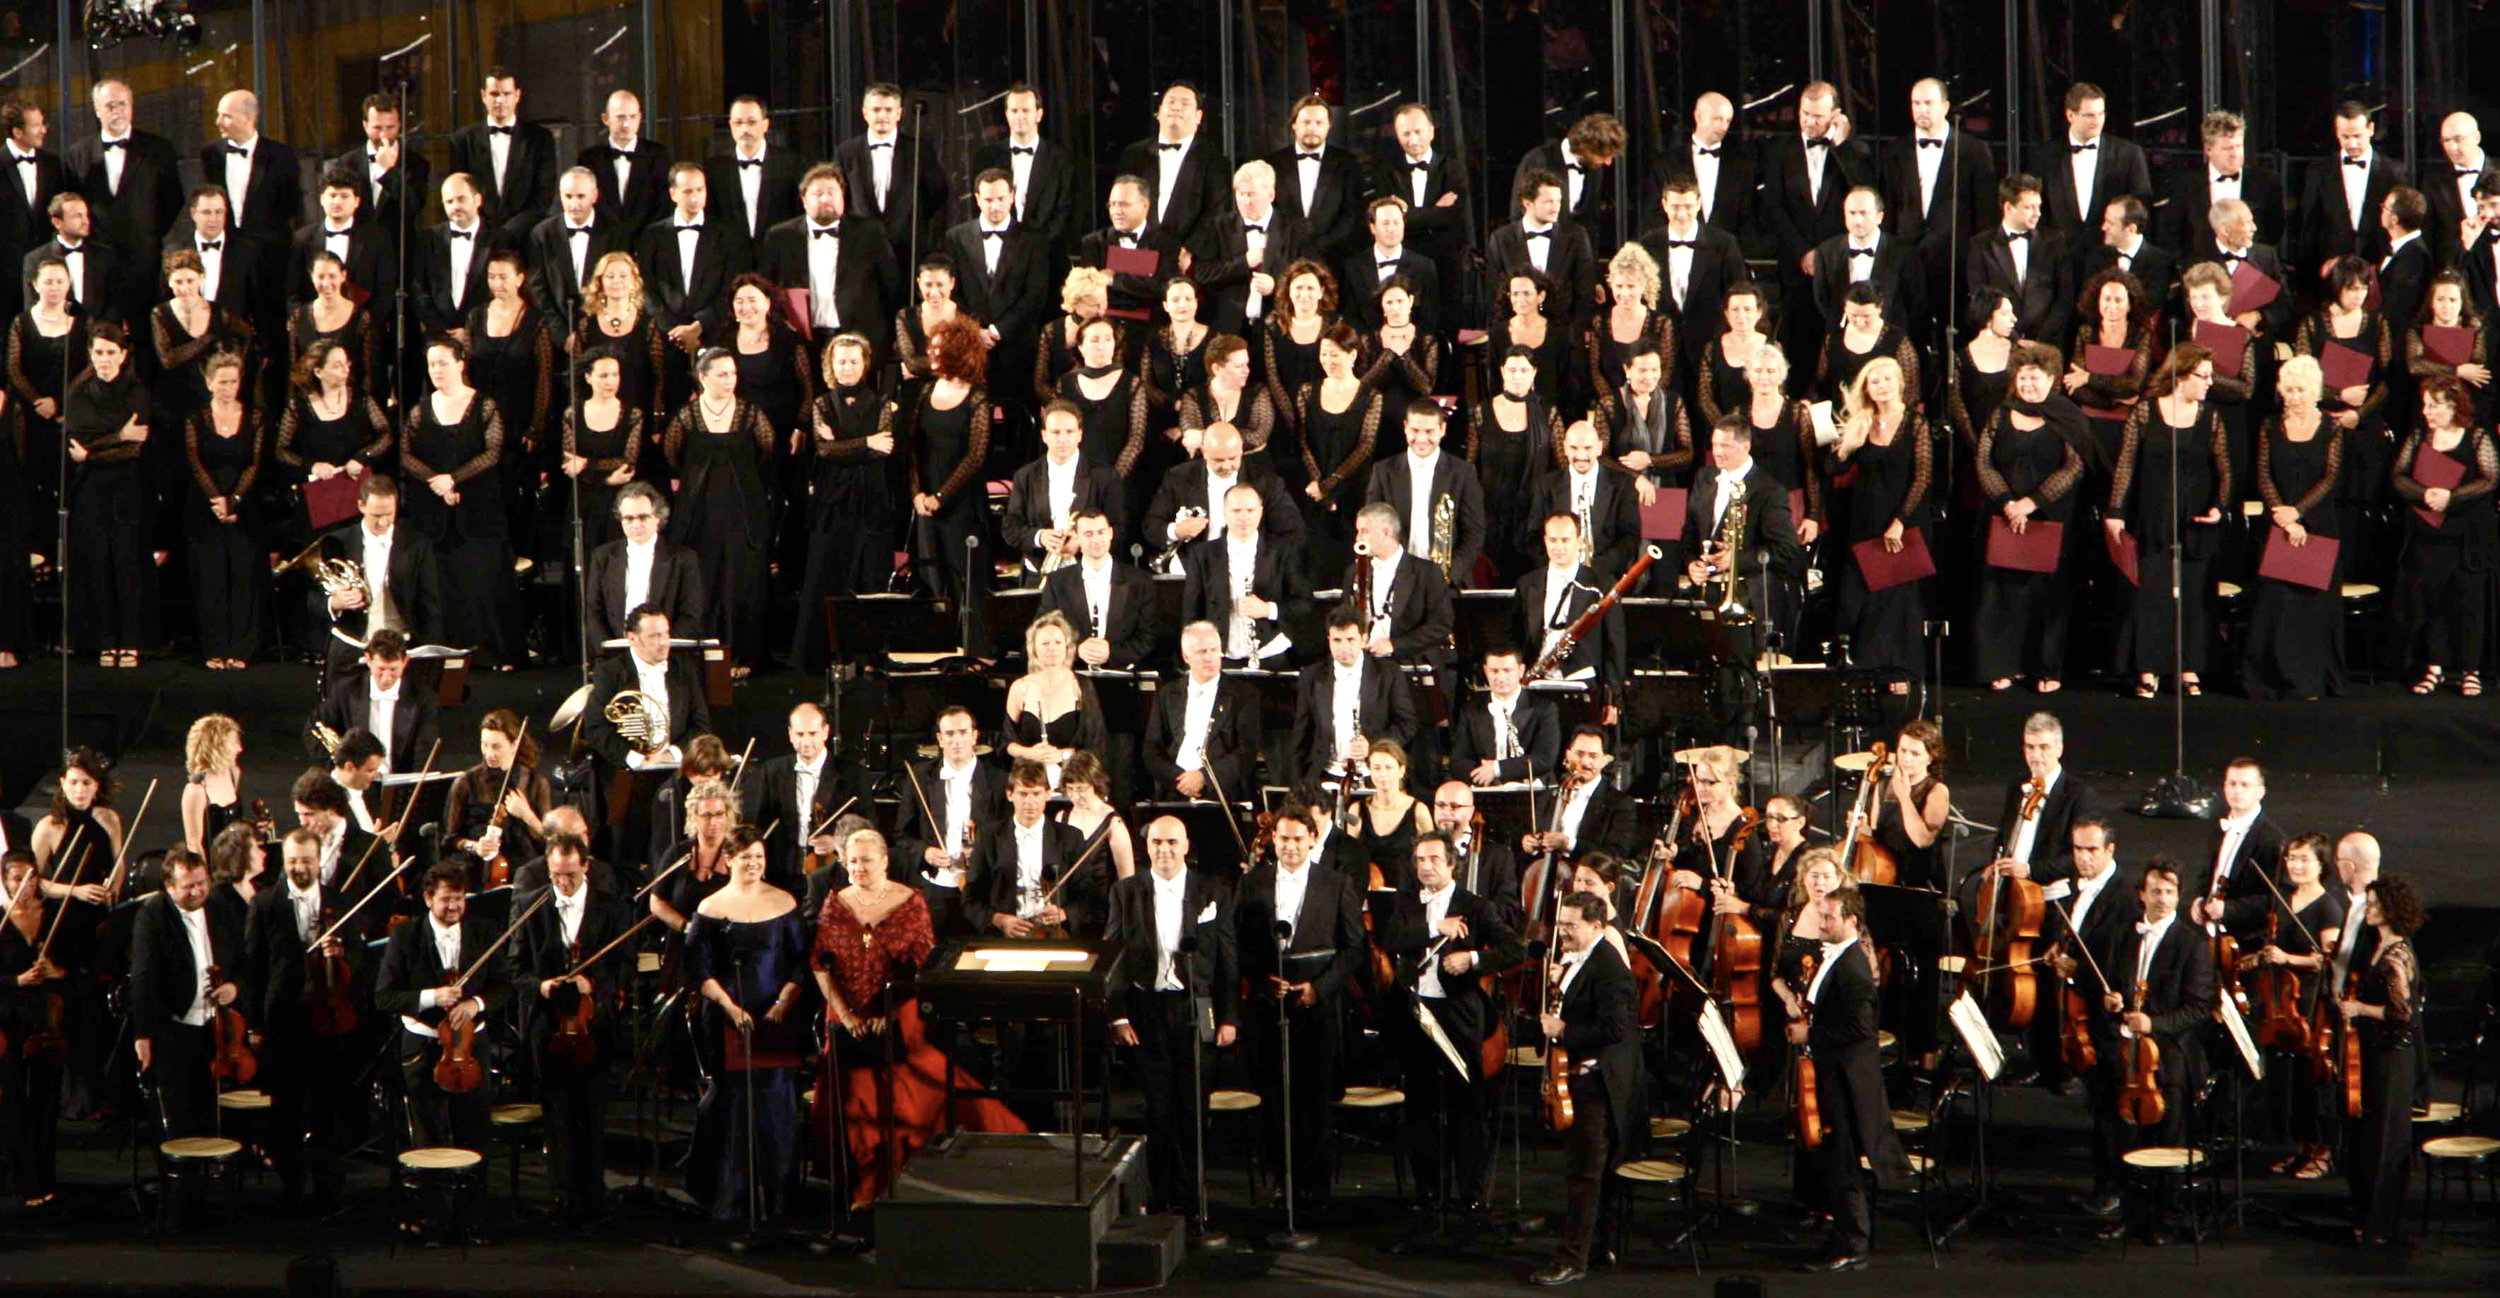 Orchestra & Chorus Maggio Musicale Fiorention at Ravenna Festival